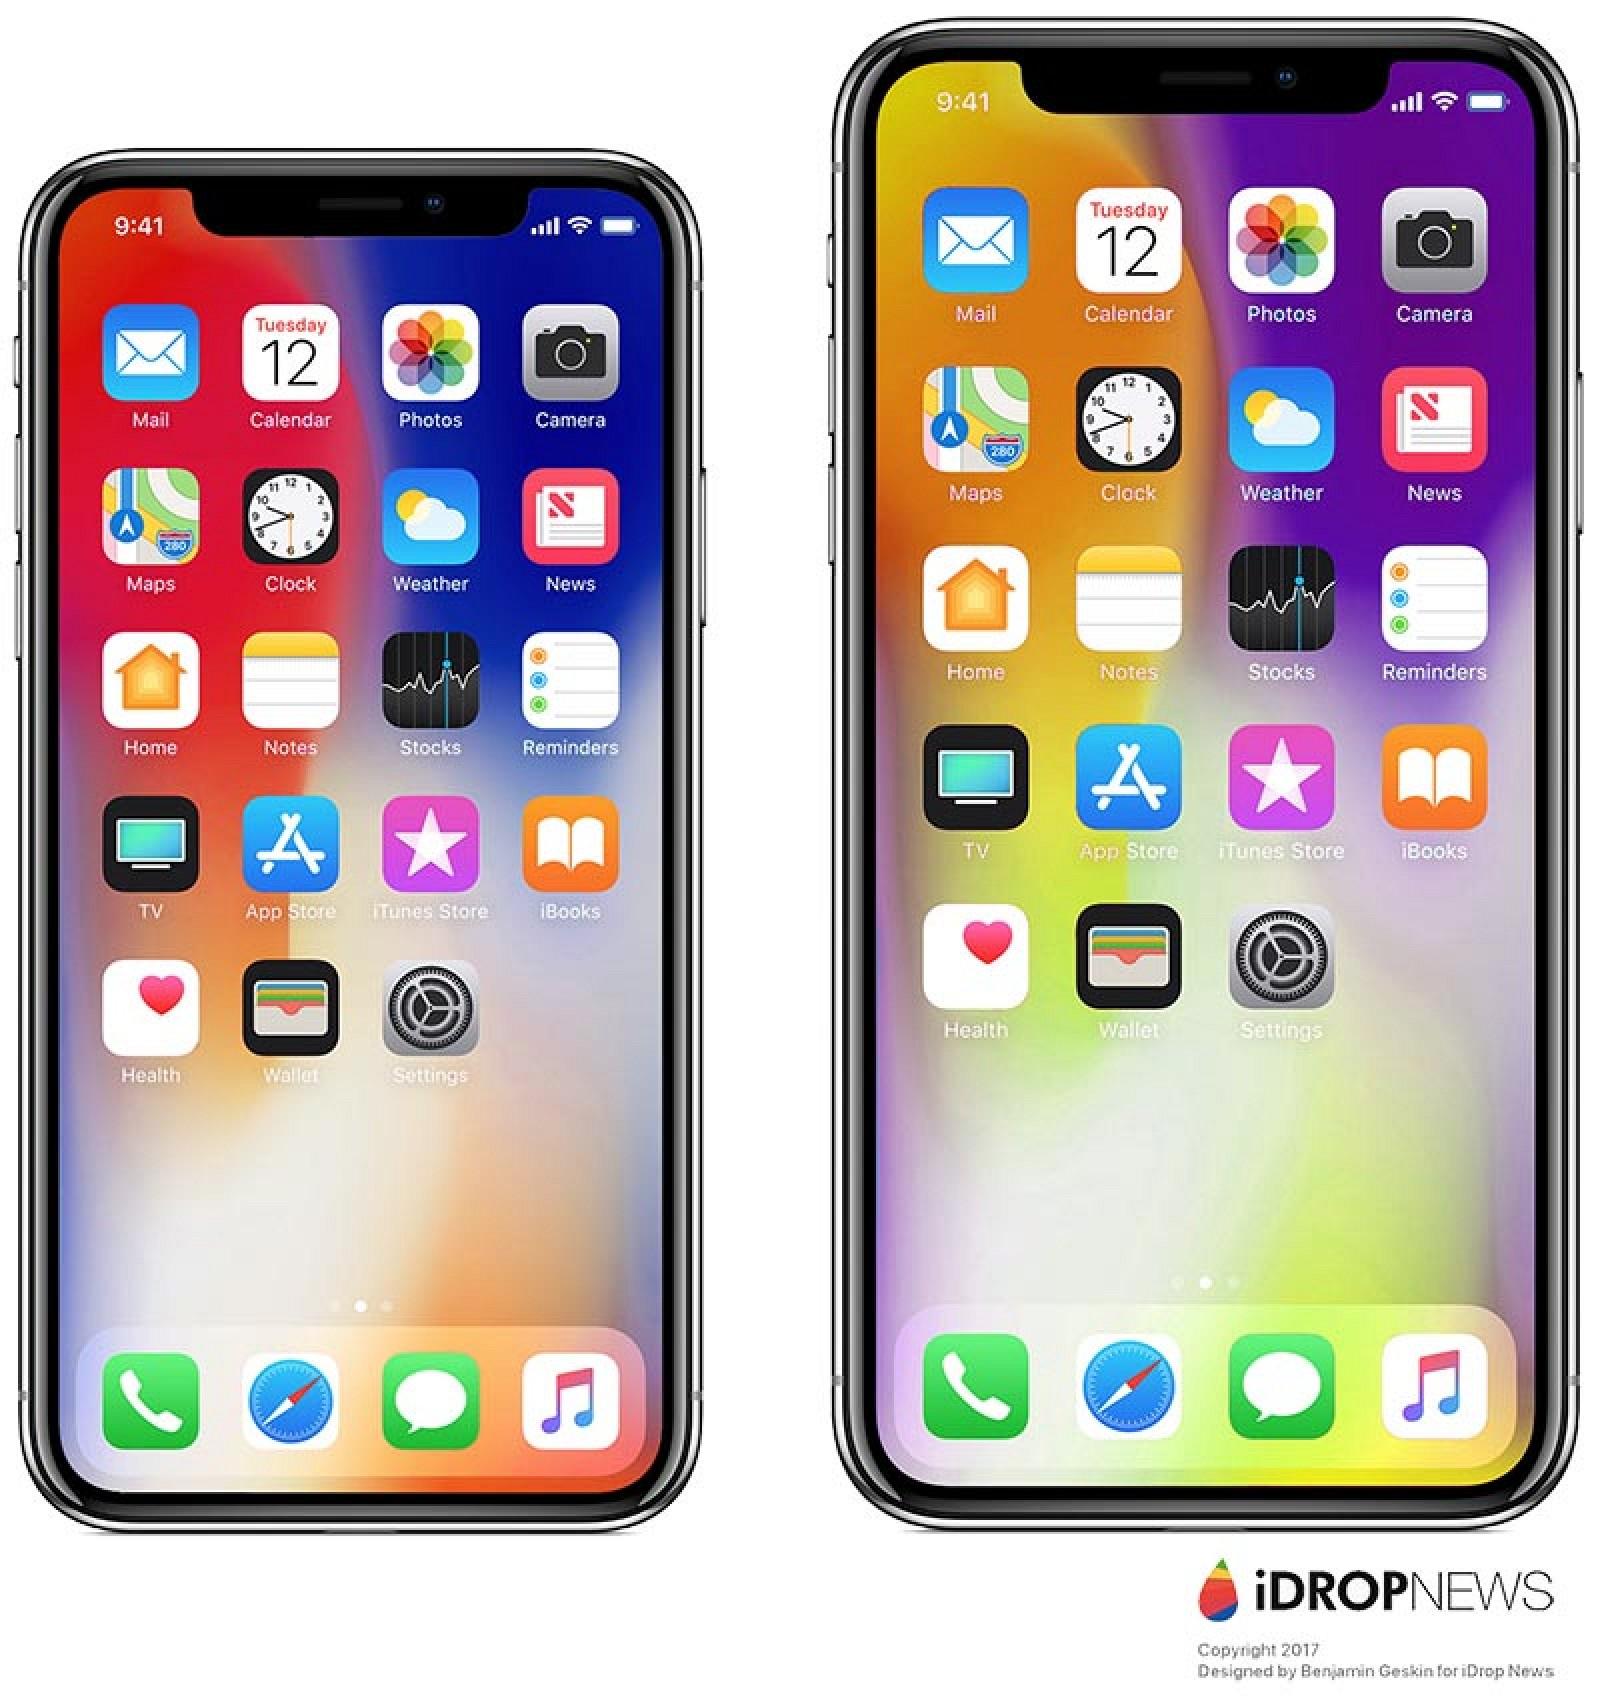 APPLE CARE IPHONE X DISPLAY